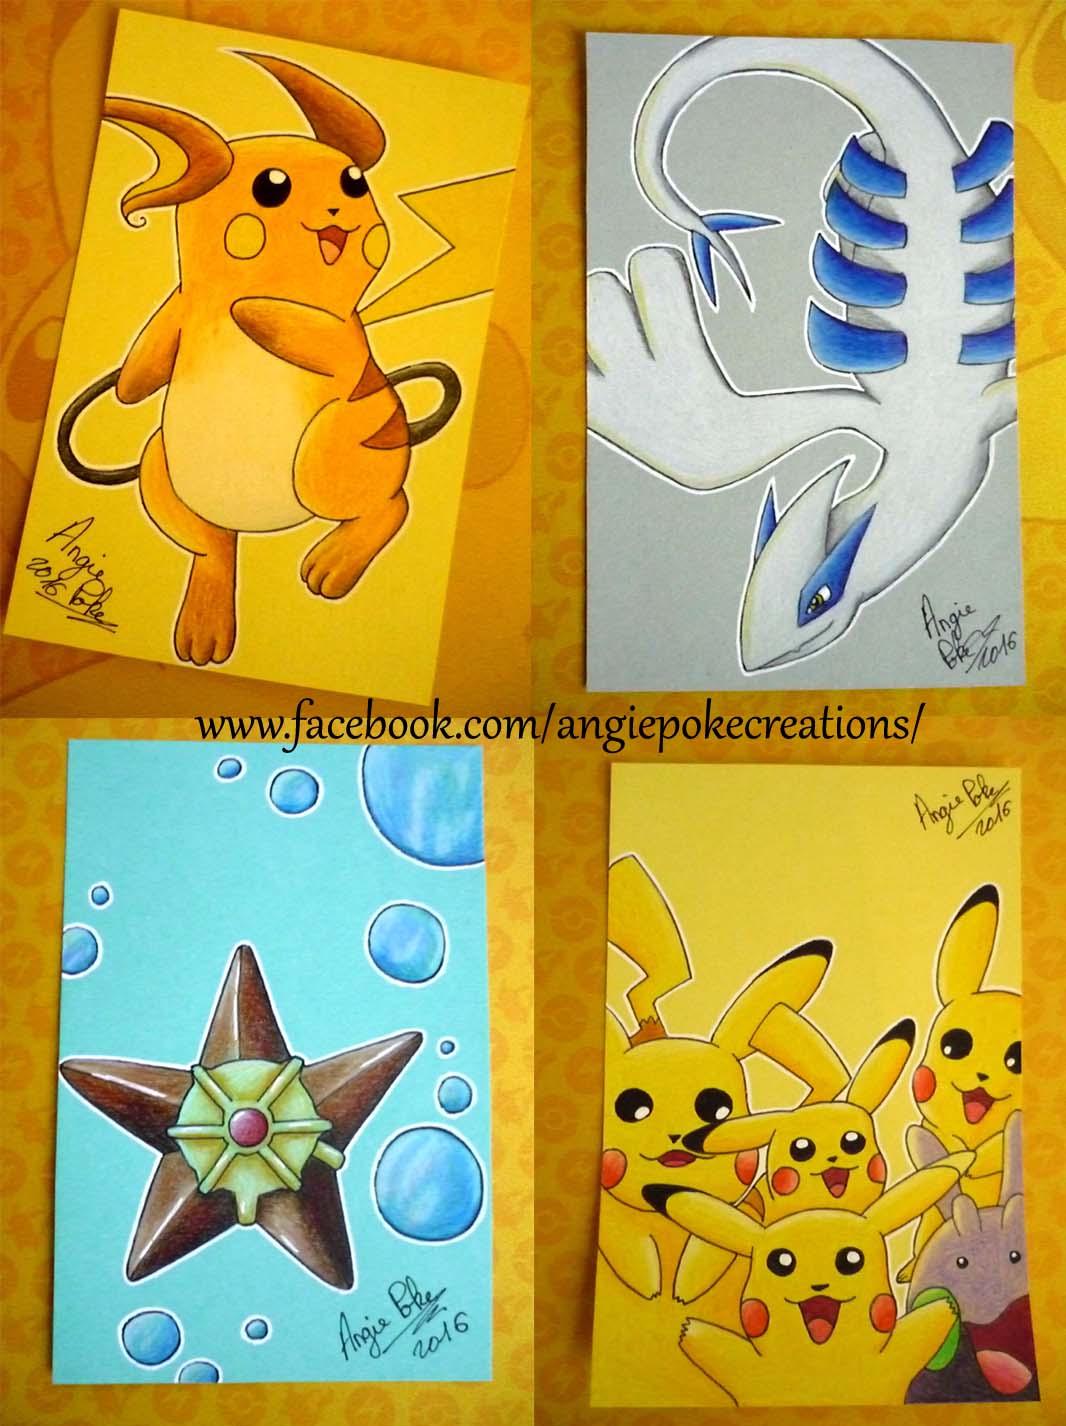 Dessins Pokemon Raichu Pikachu Lugia Angie Poke Créations